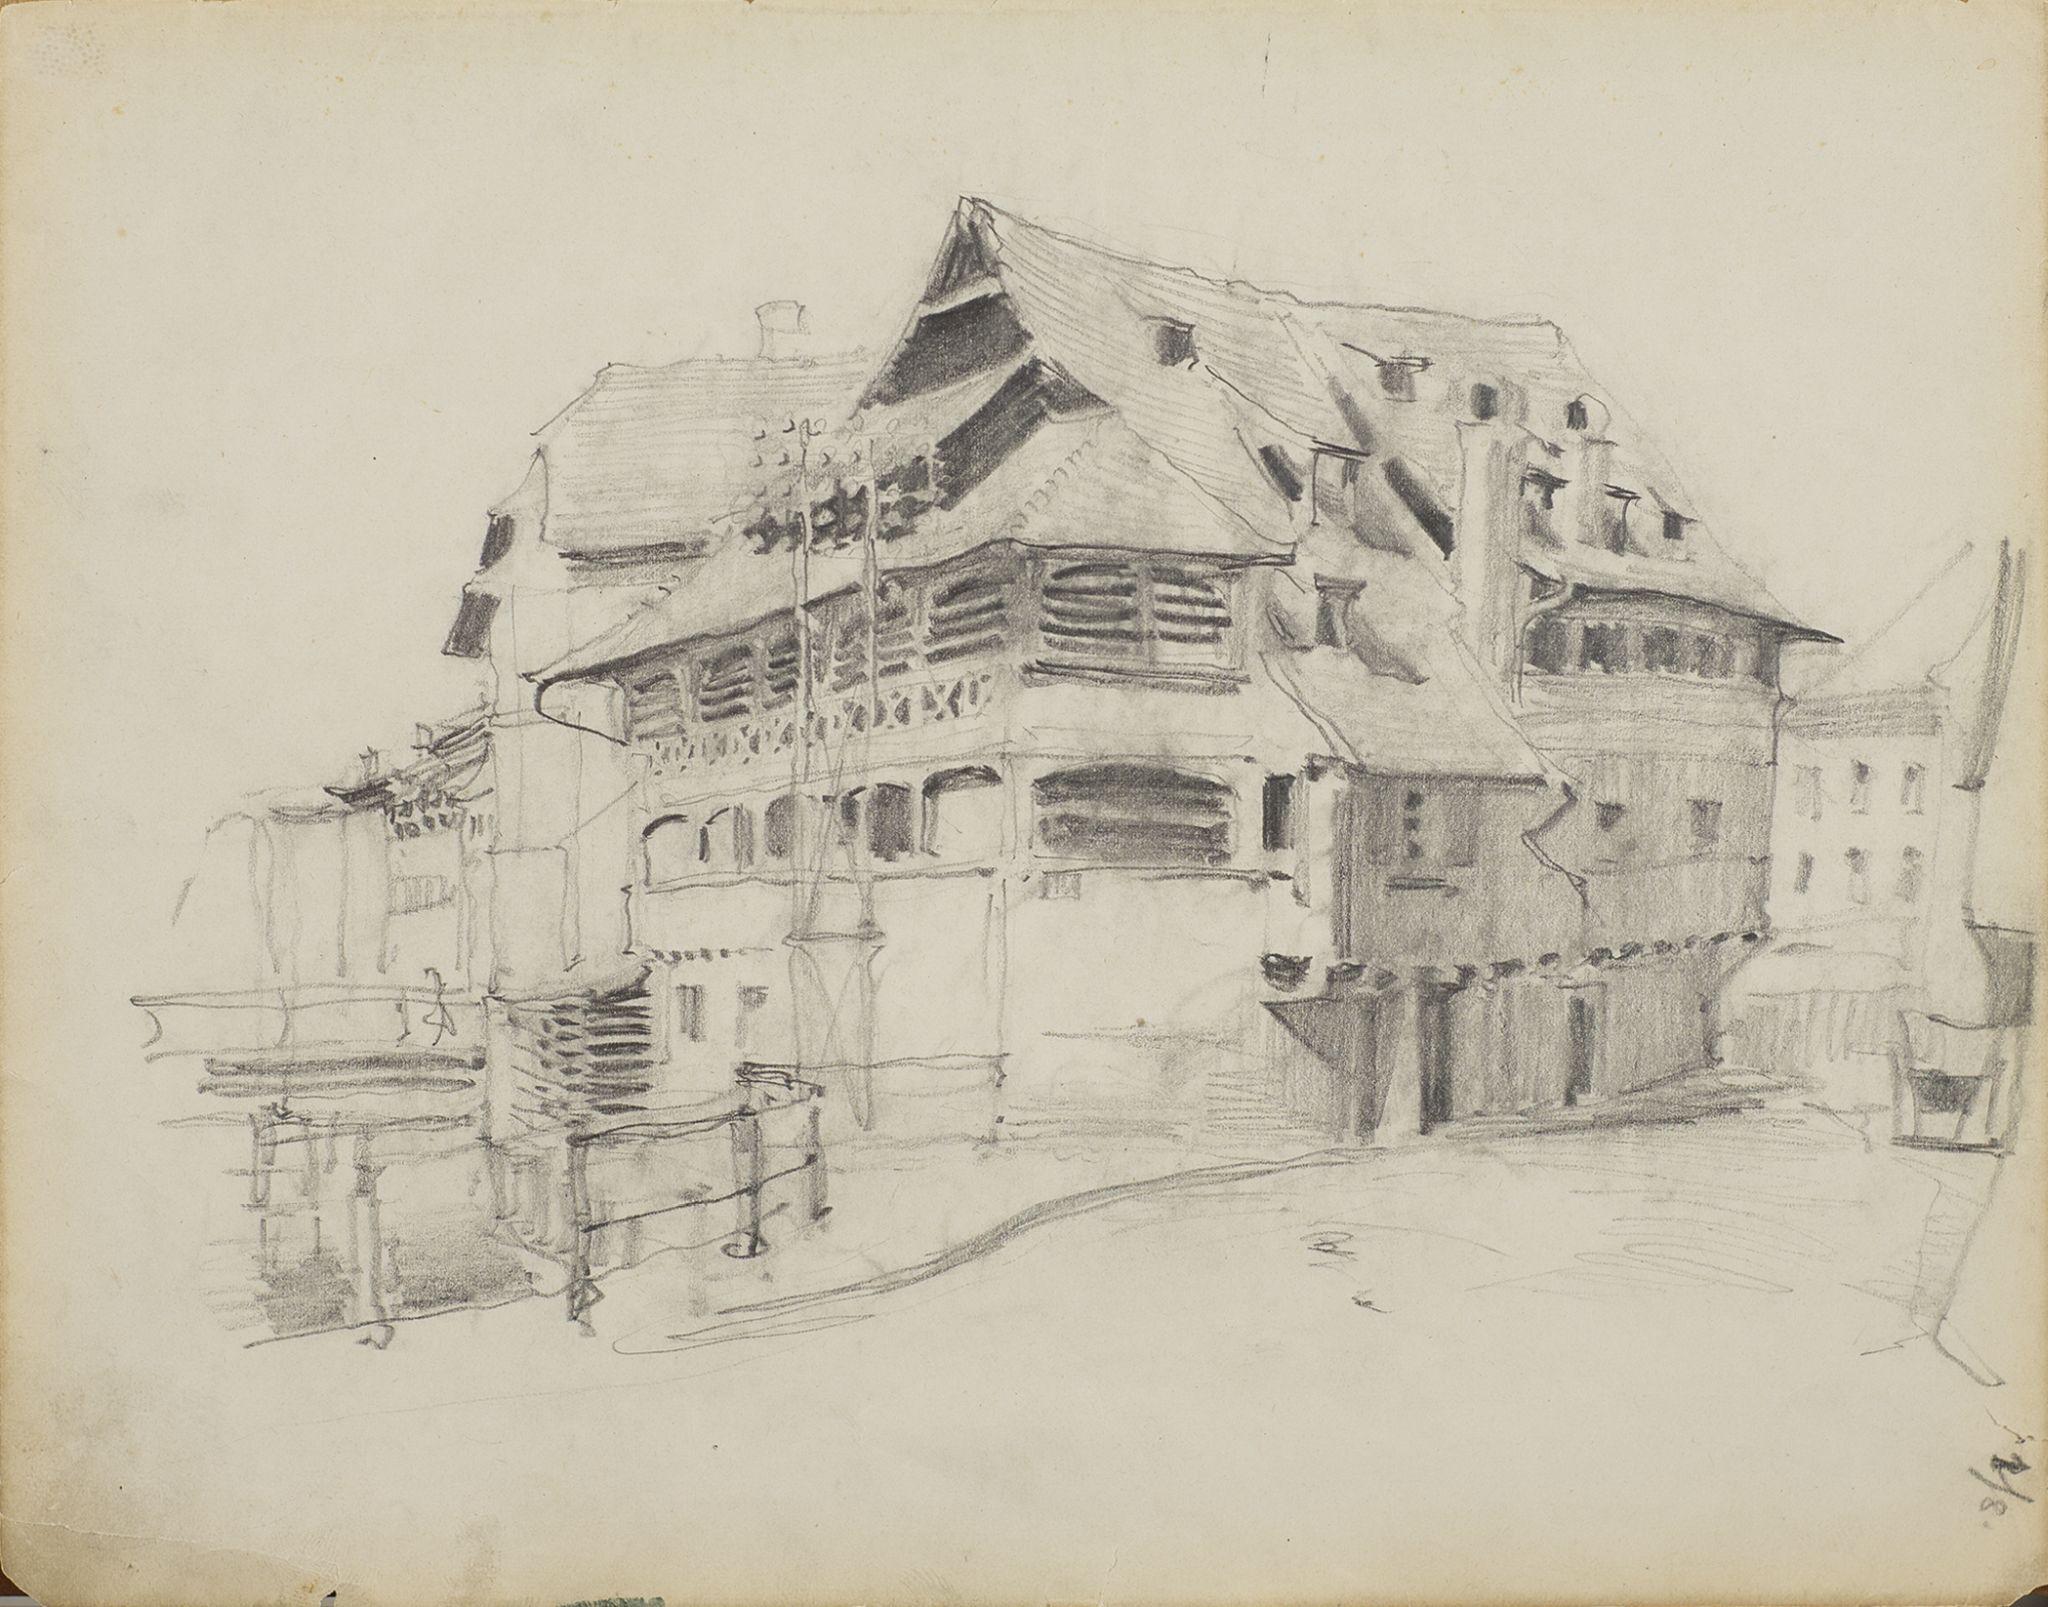 SZKIC Z LA PETITE FRANCE W STRASBURGU, 01.09.1892 r.